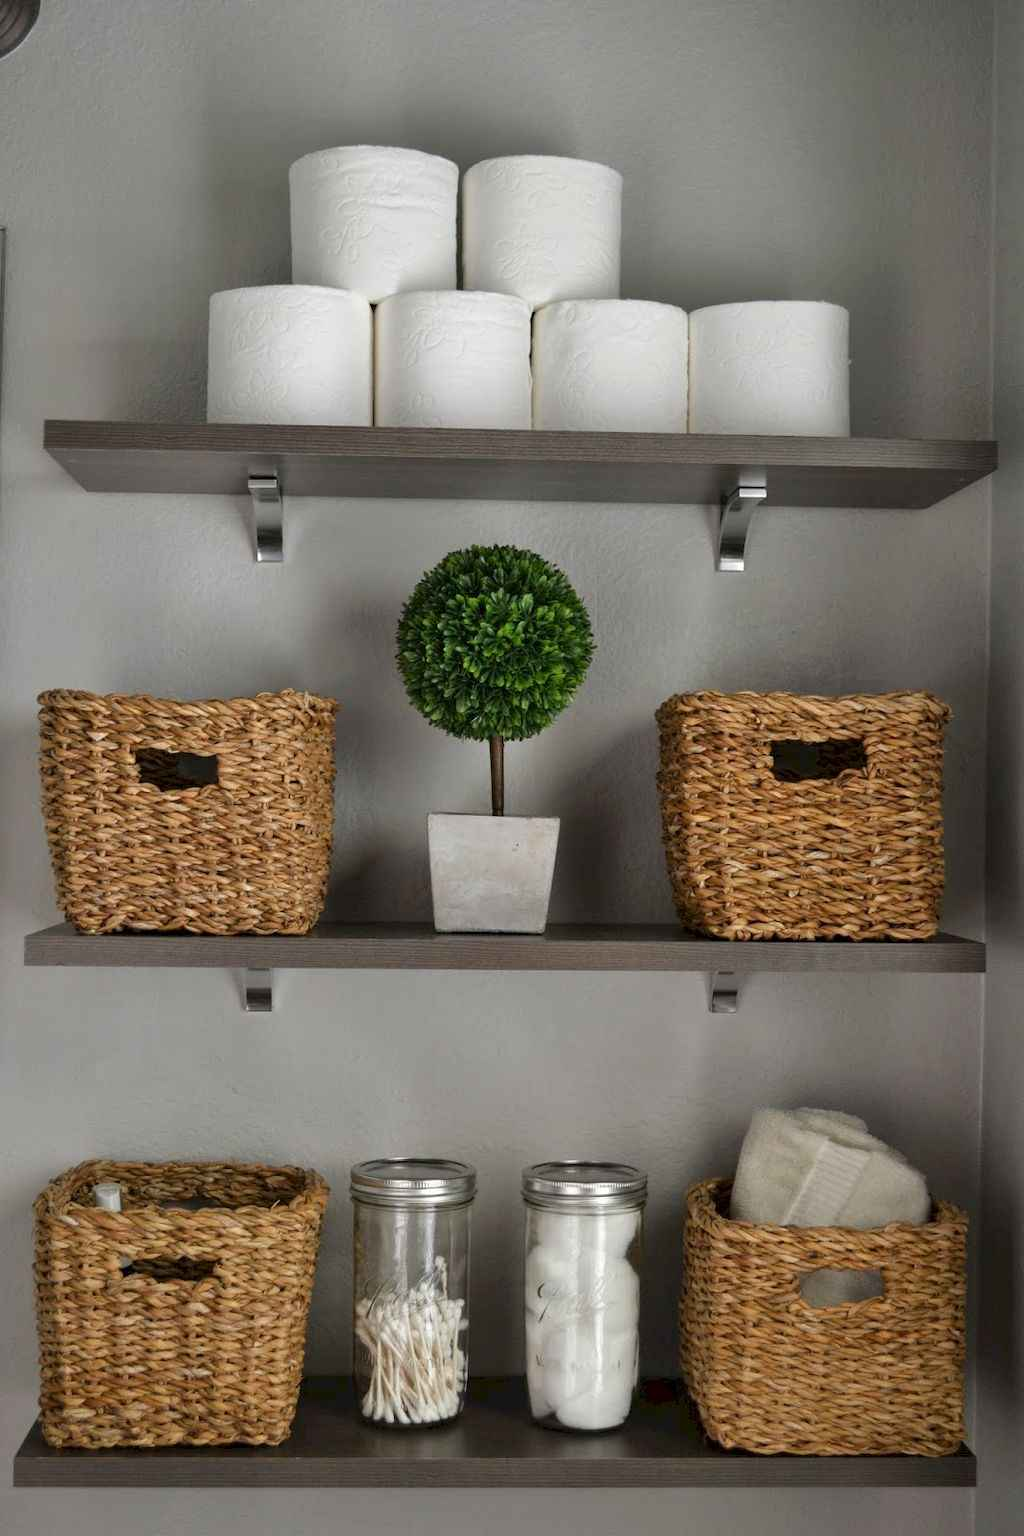 Cool bathroom storage shelves organization ideas (3)